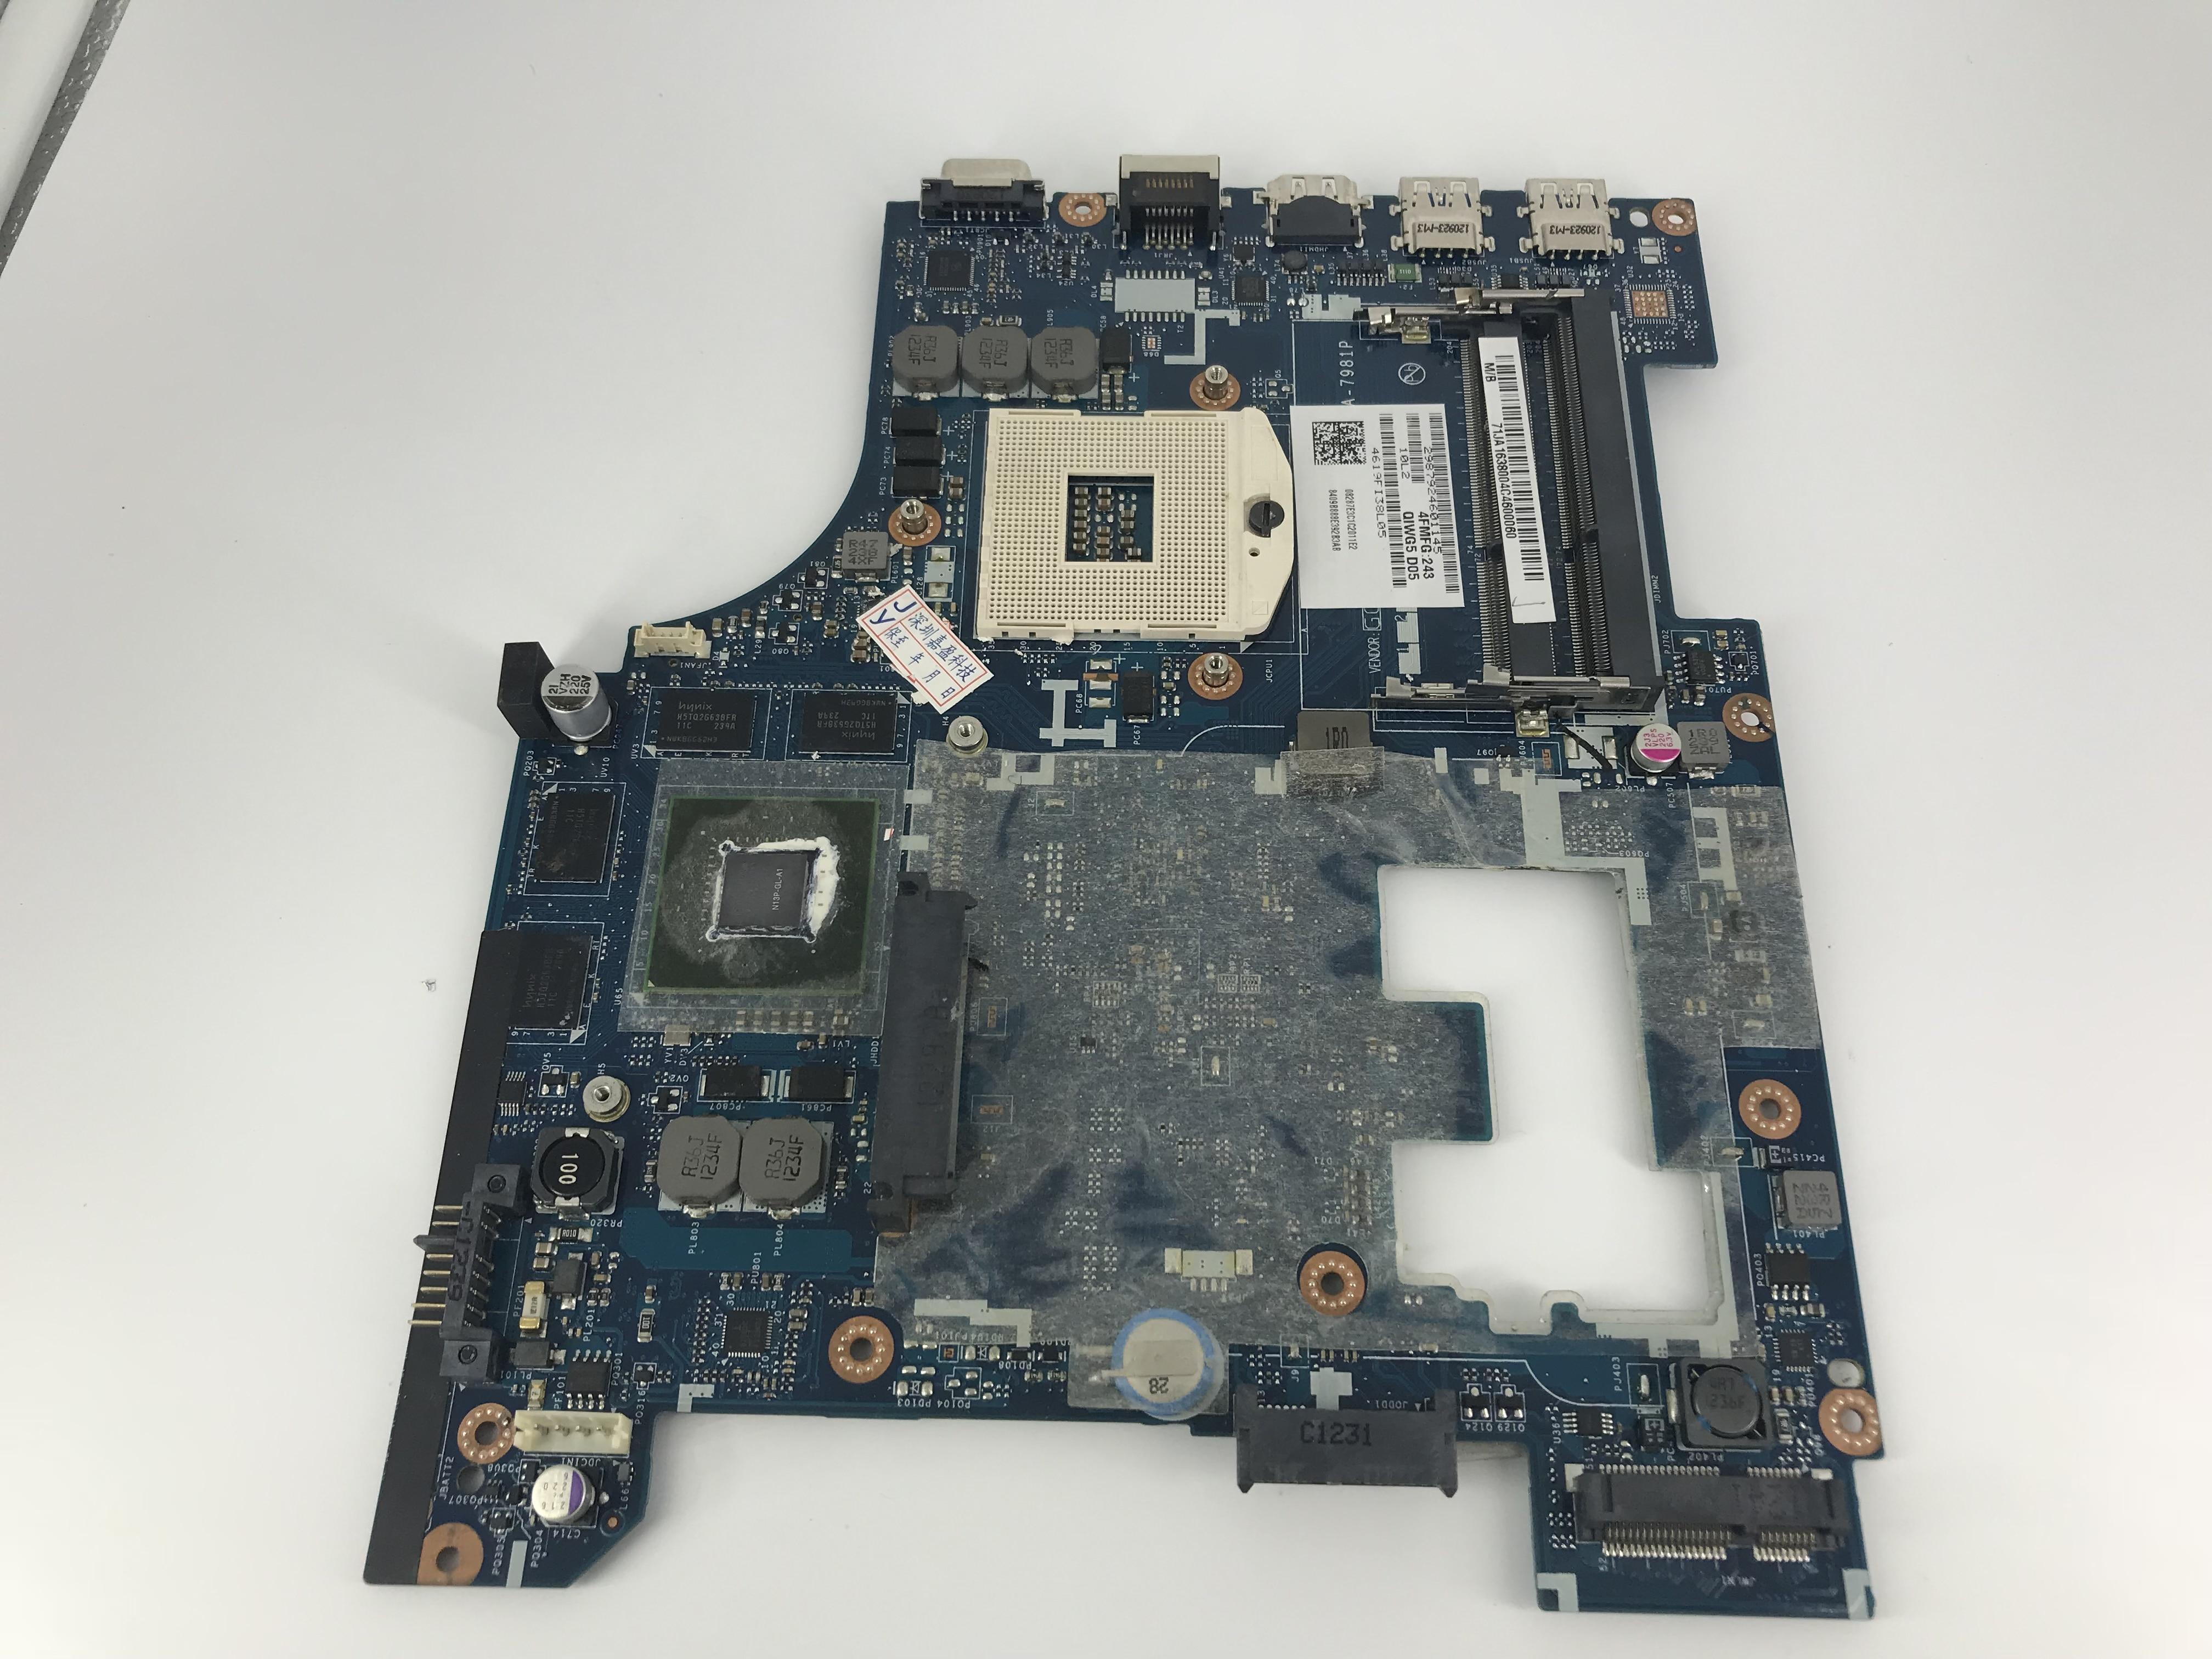 De alta calidad de la placa base 11S900007 para Lenovo G580 placa base de computadora portátil QIWG5_G6_G9 LA-7981P PGA989 SLJ8E HM76 DDR3 100% probado